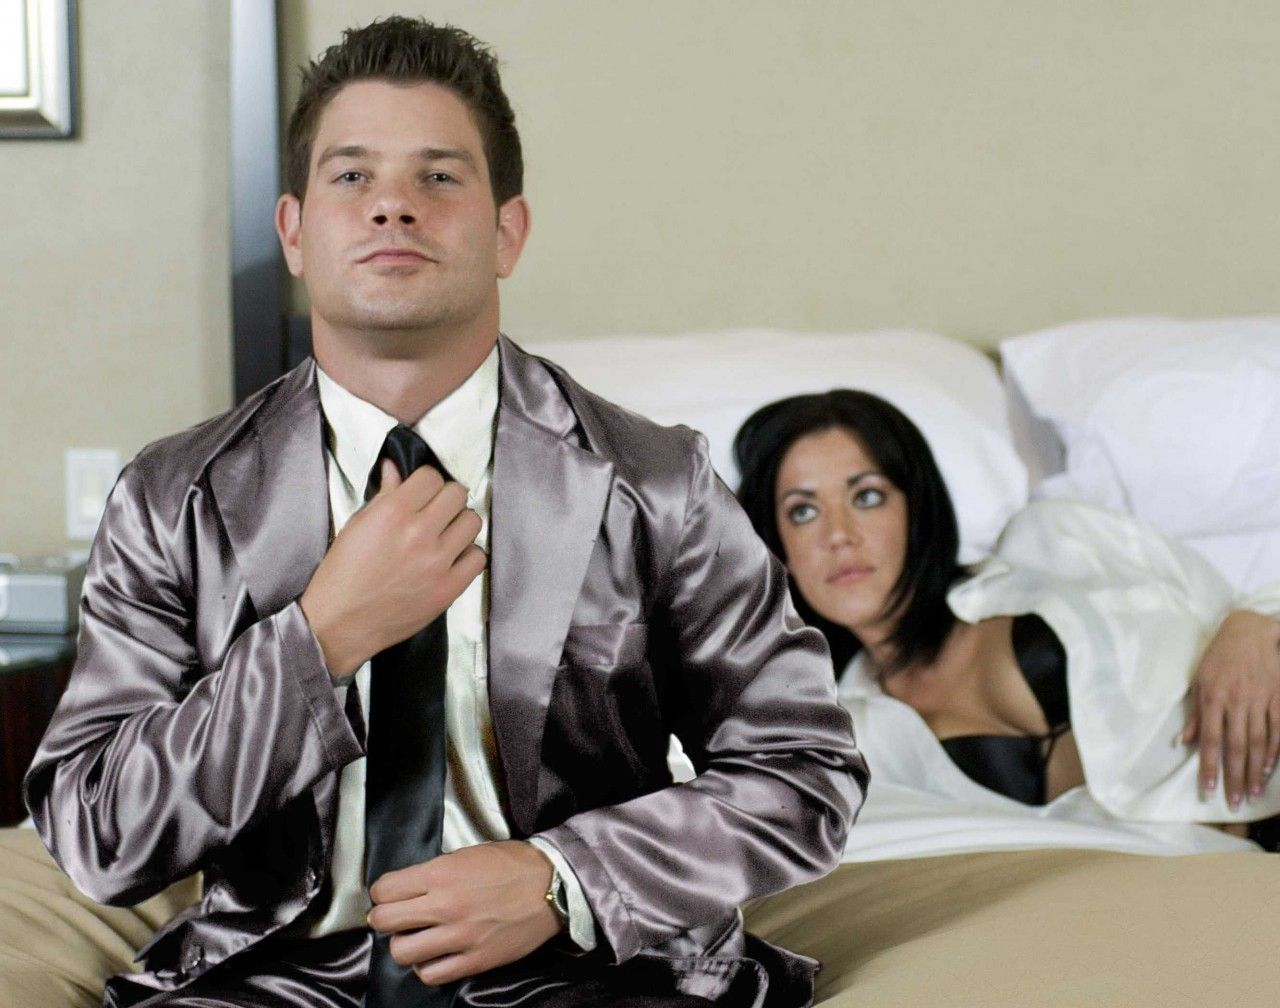 Suitjamas.com Store - New! Large Armani Grey / Ivory Premium Suitjamas, $89.95 (http://www.suitjamas.com/new-large-armani-grey-ivory-premium-suitjamas/)